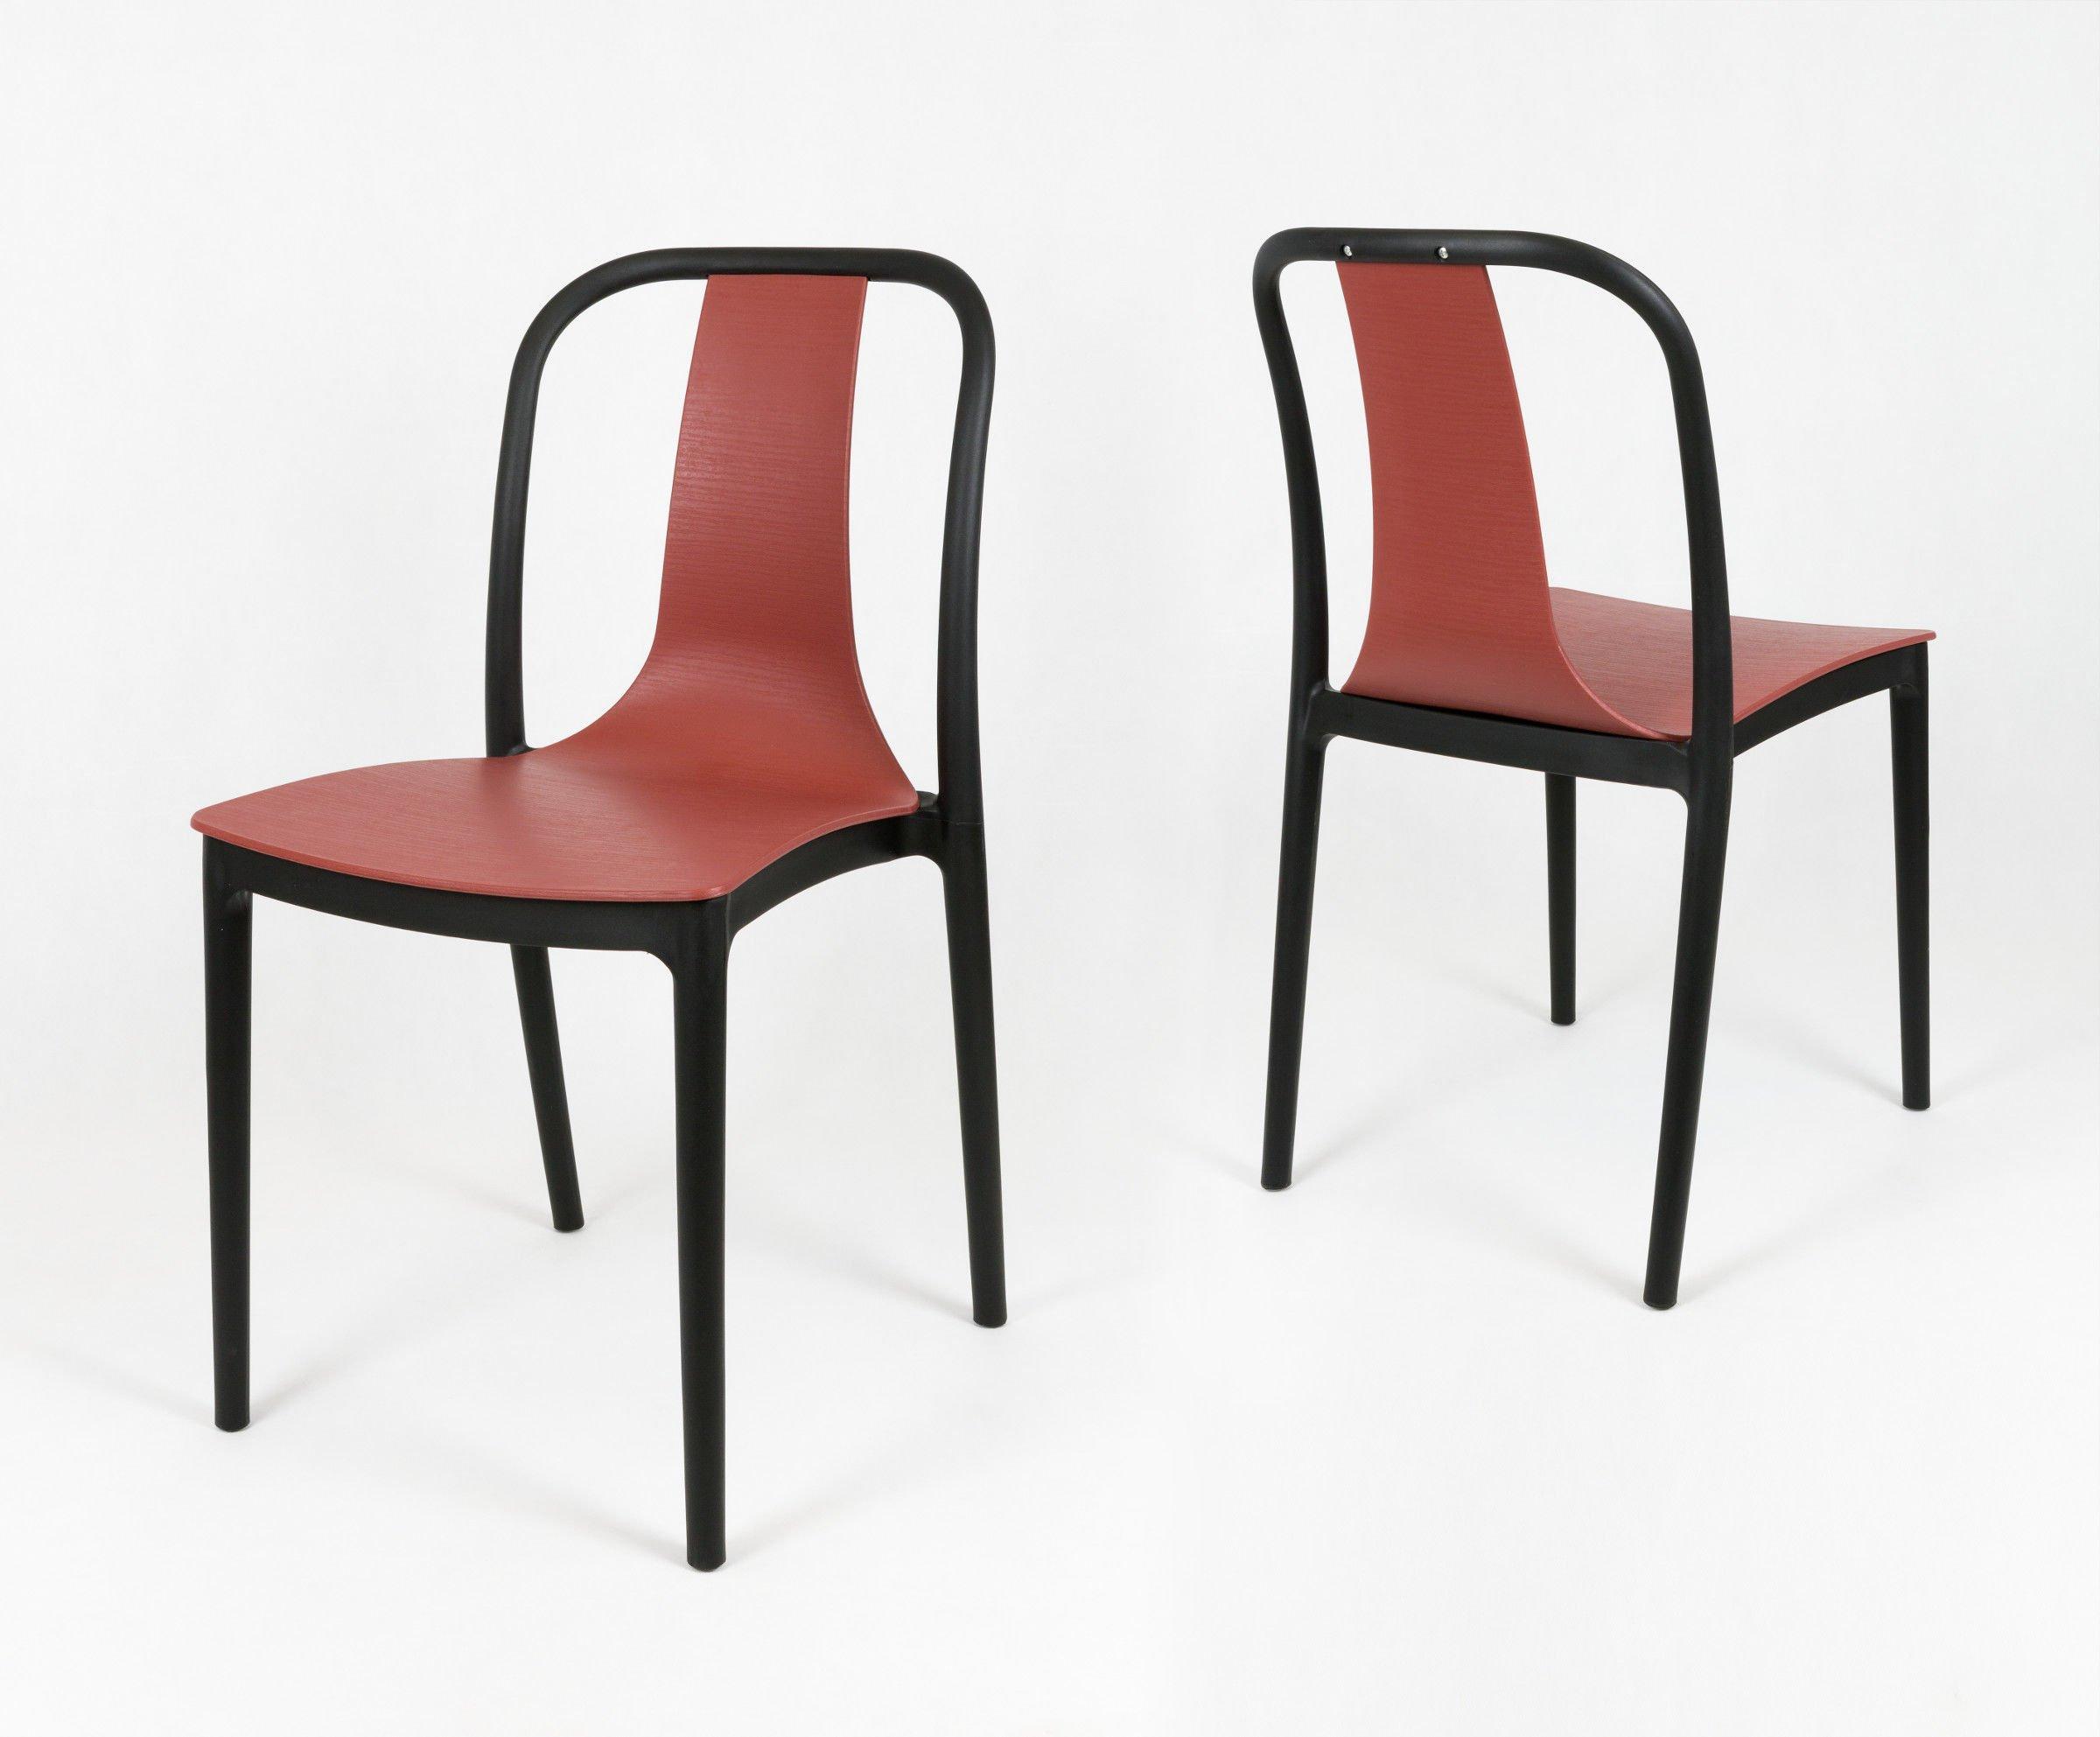 Fesselnde Wohnzimmer Stühle Foto Von Kliknij, Aby Powiększyć